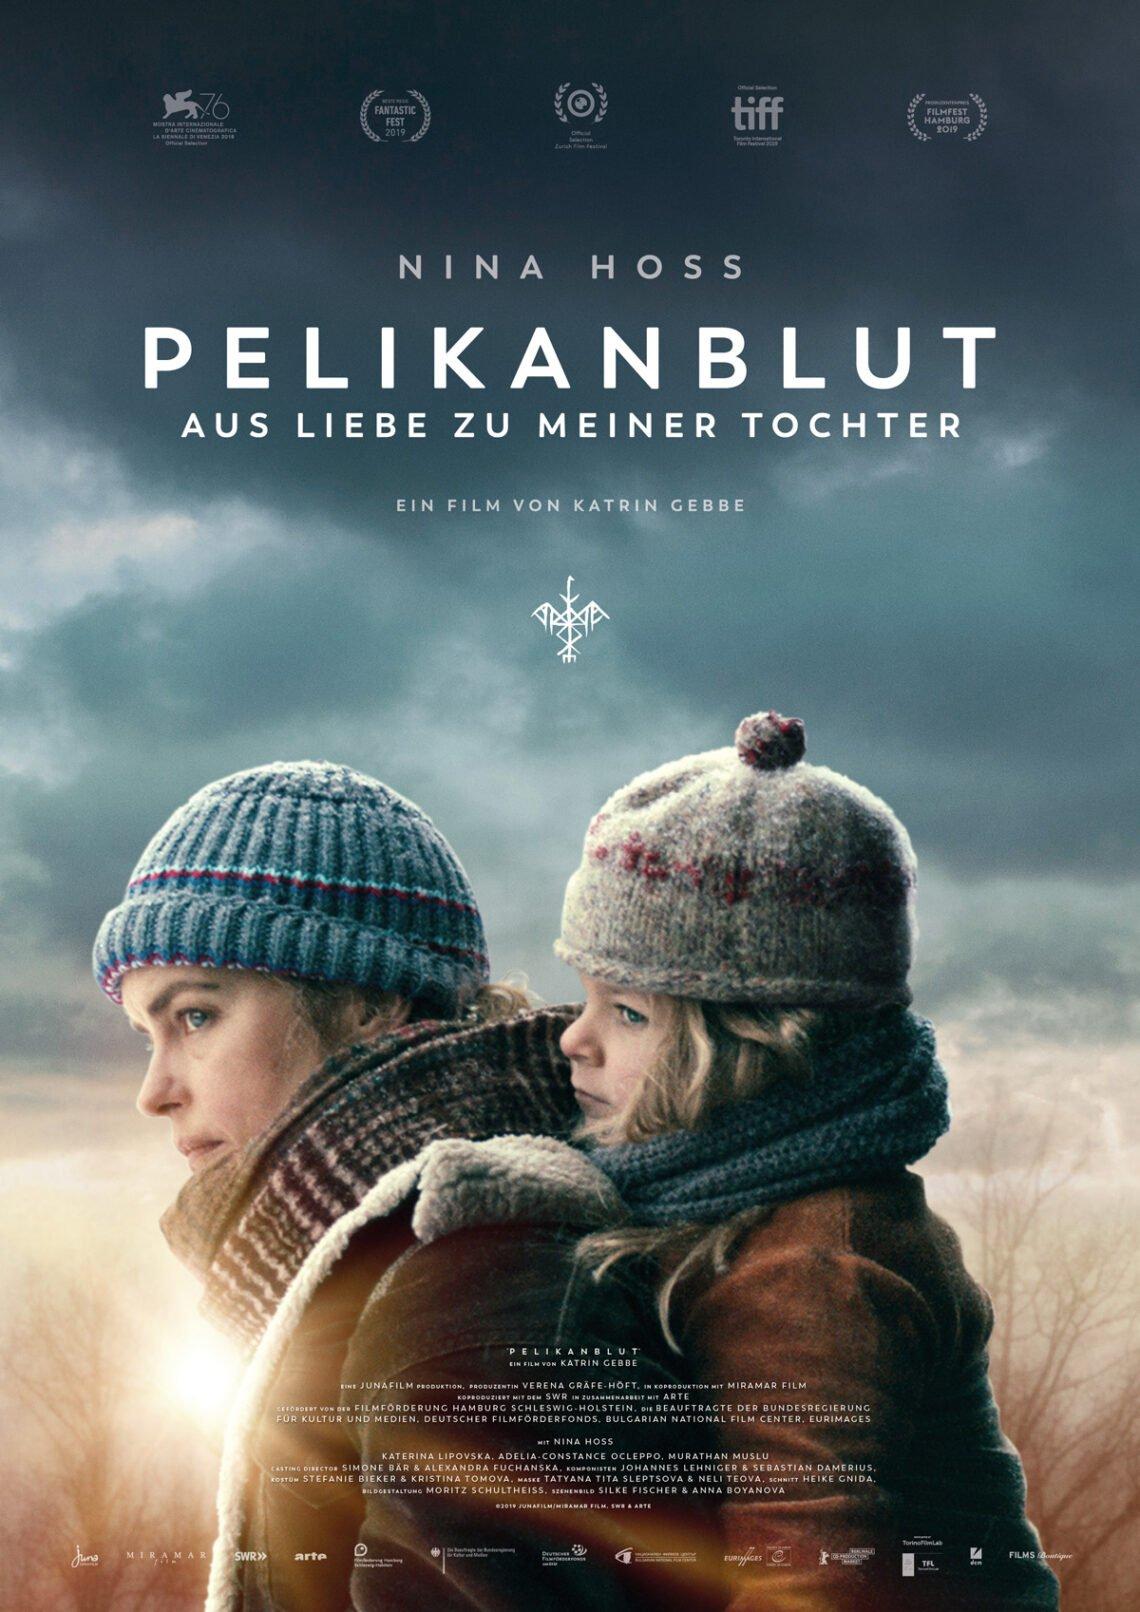 conny doll lifestyle: Pelikanblut Filmplakat, Kinostart, Gewinnspiel, Kinokarten, Verlosung, Giveaway